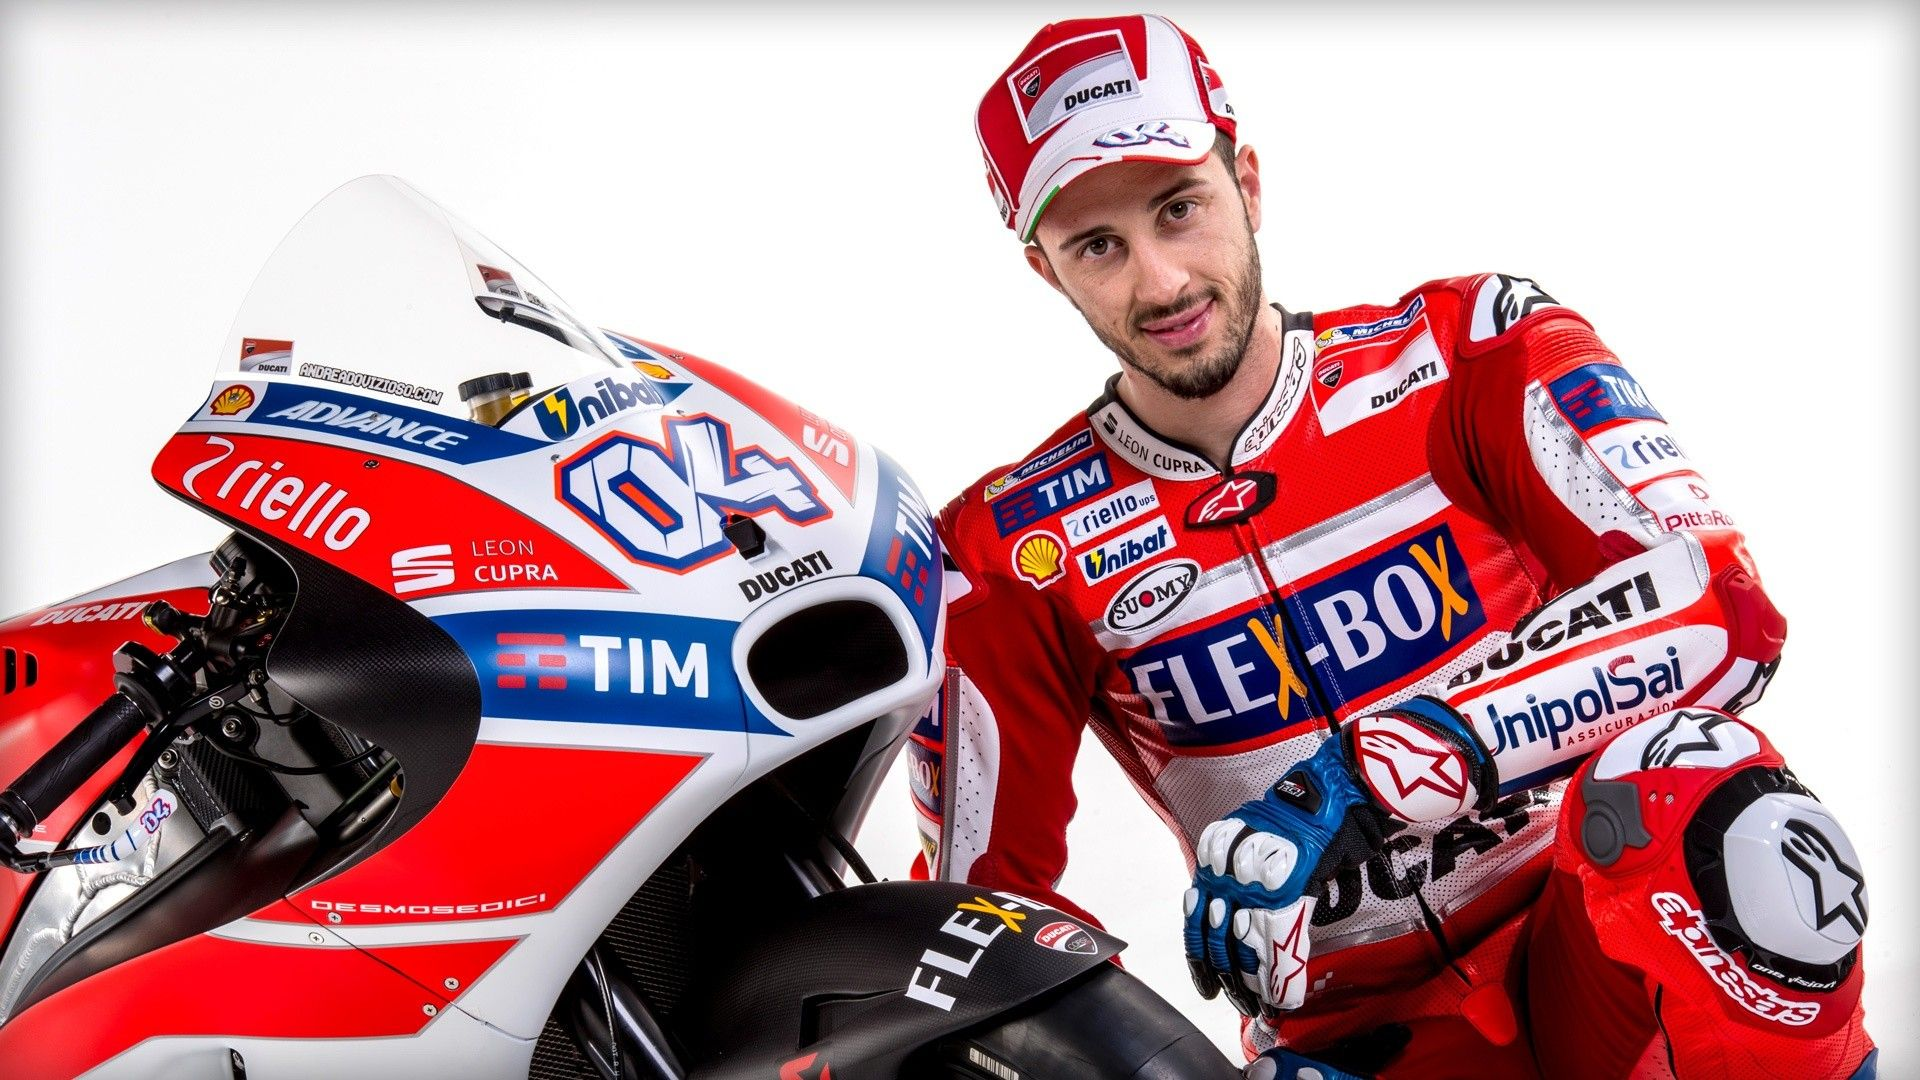 Live Wallpaper Hd Motogp Ducati Ducati Motor